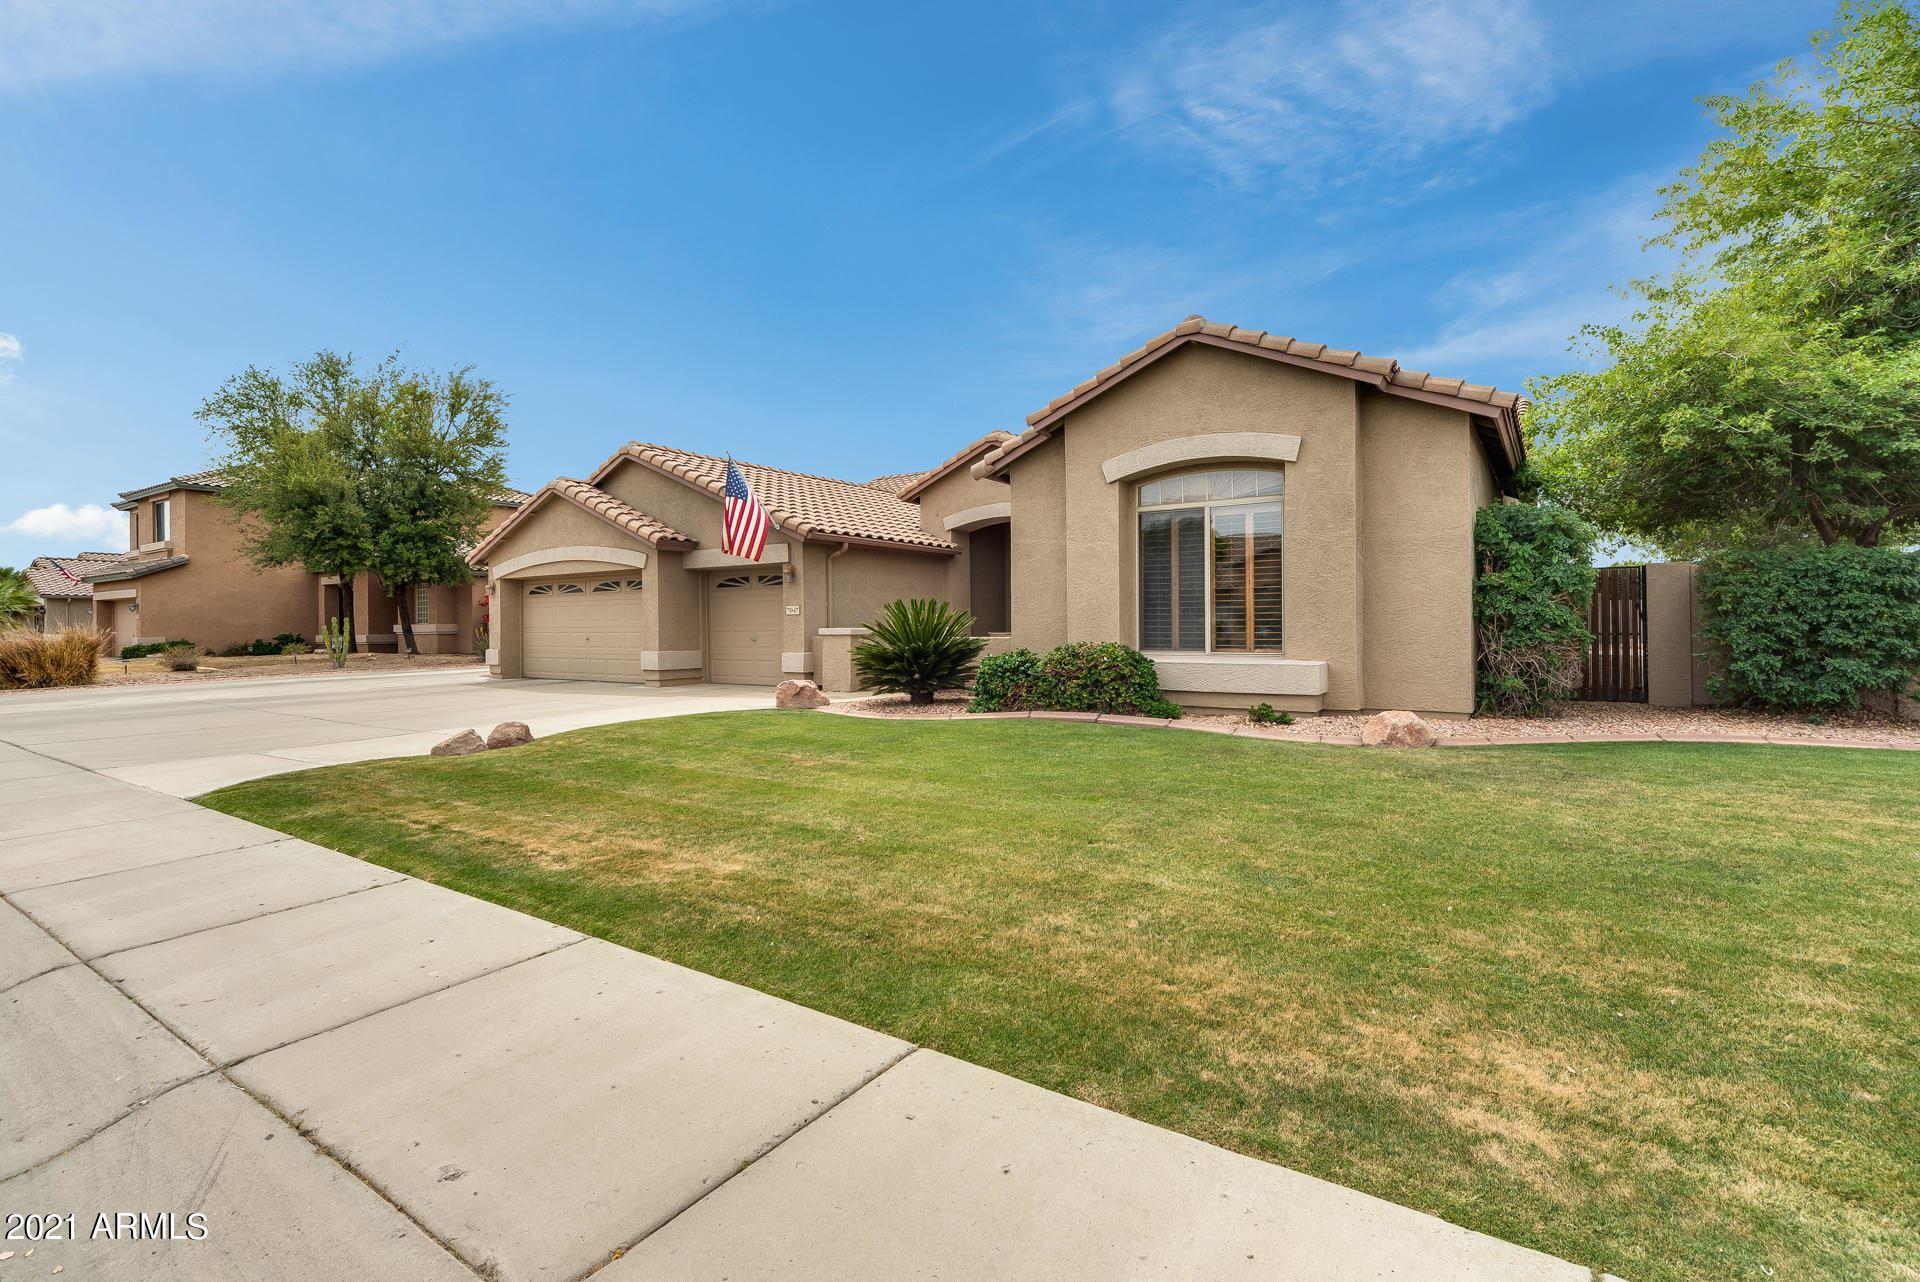 Photo of 7047 W SAINT JOHN Road, Glendale, AZ 85308 (MLS # 6223762)